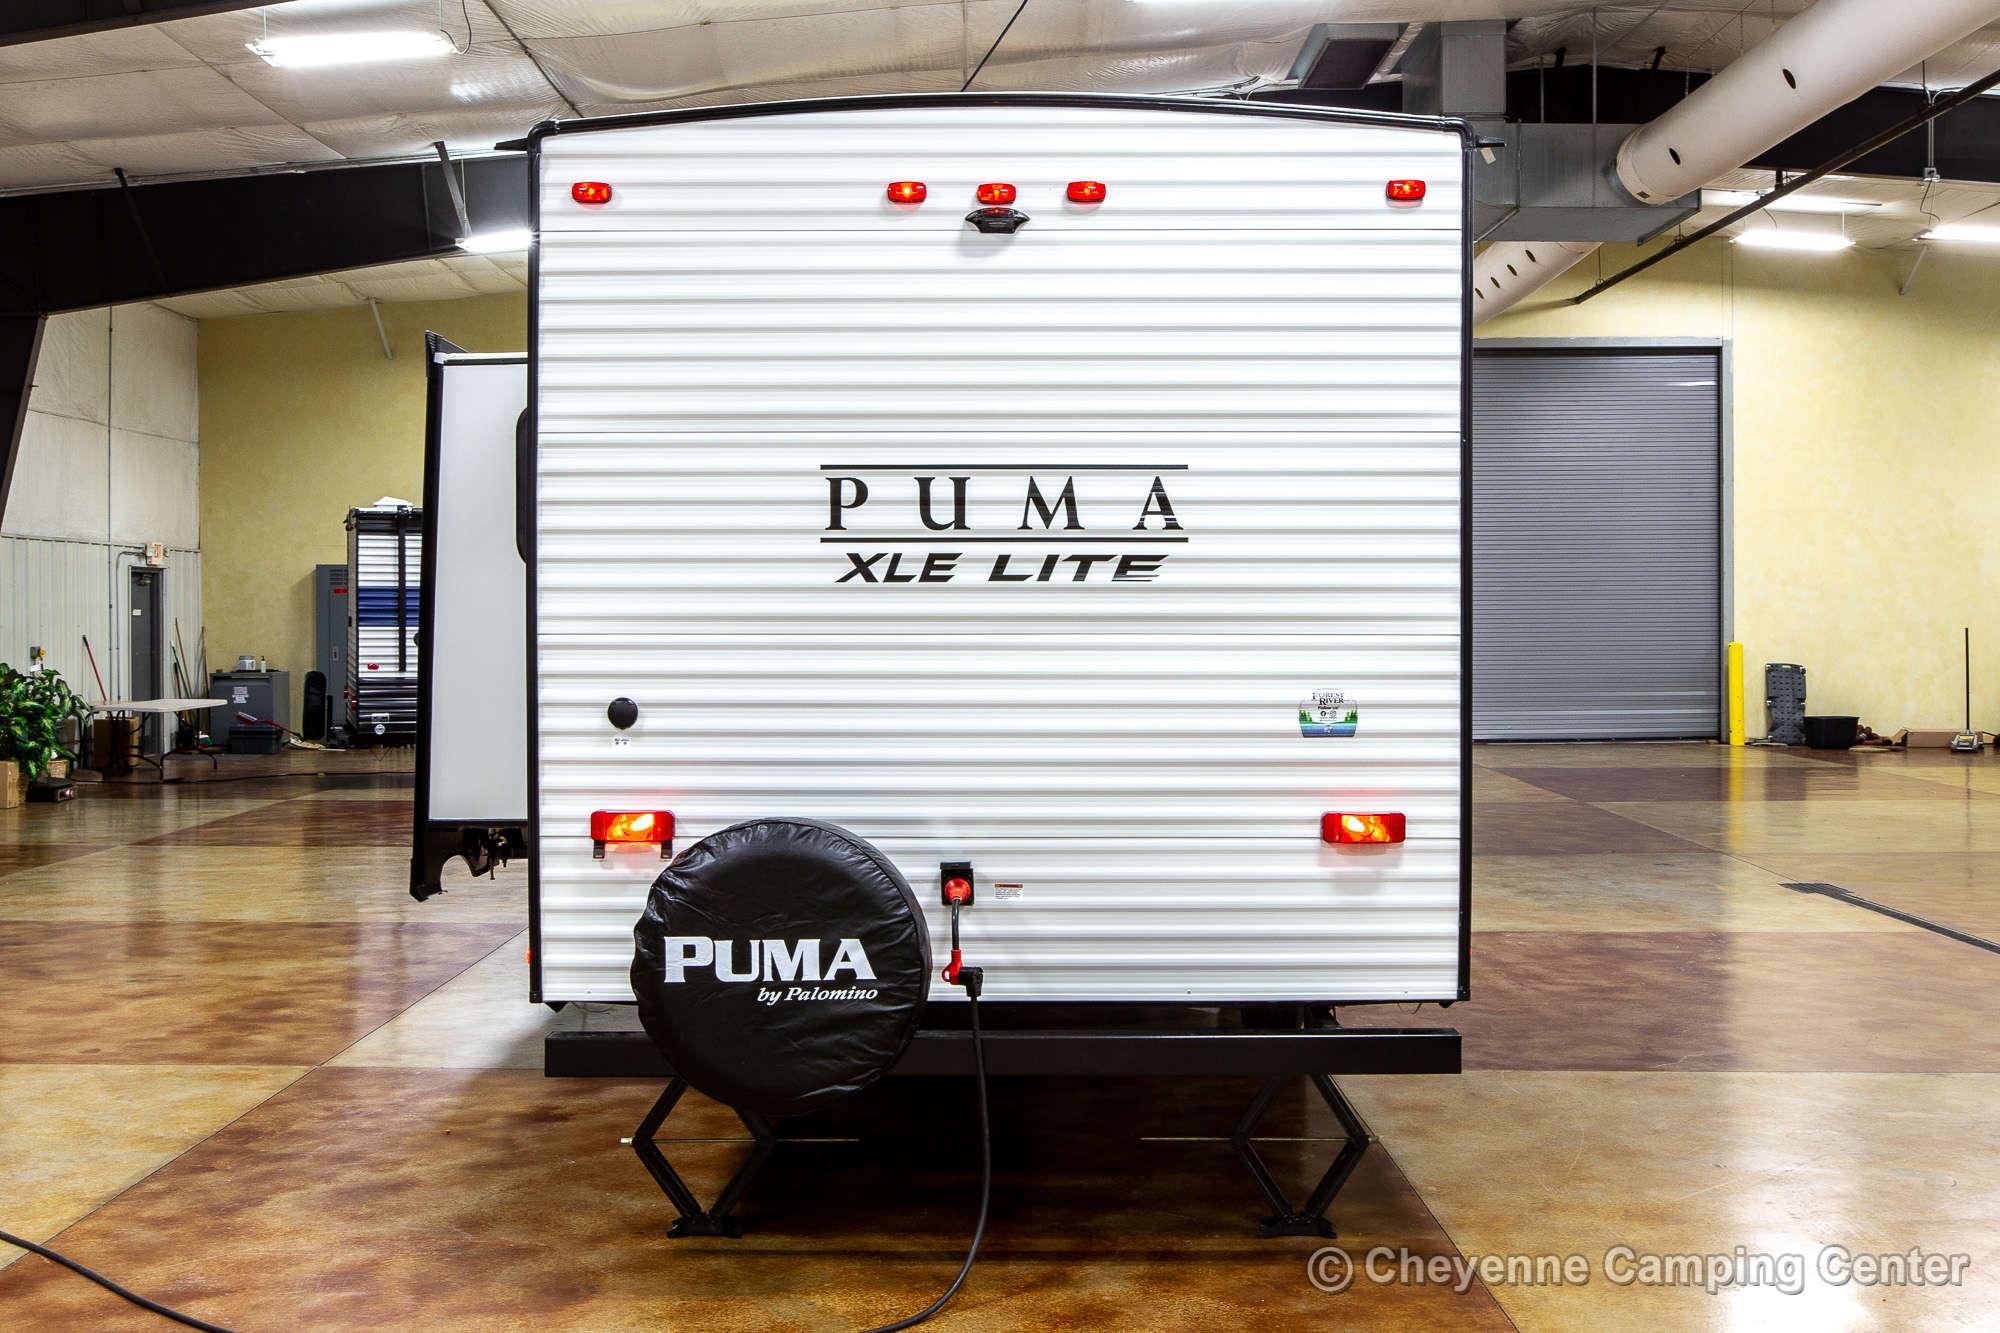 2022 Palomino Puma XLE Lite 30DBSC Bunkhouse Travel Trailer Exterior Image